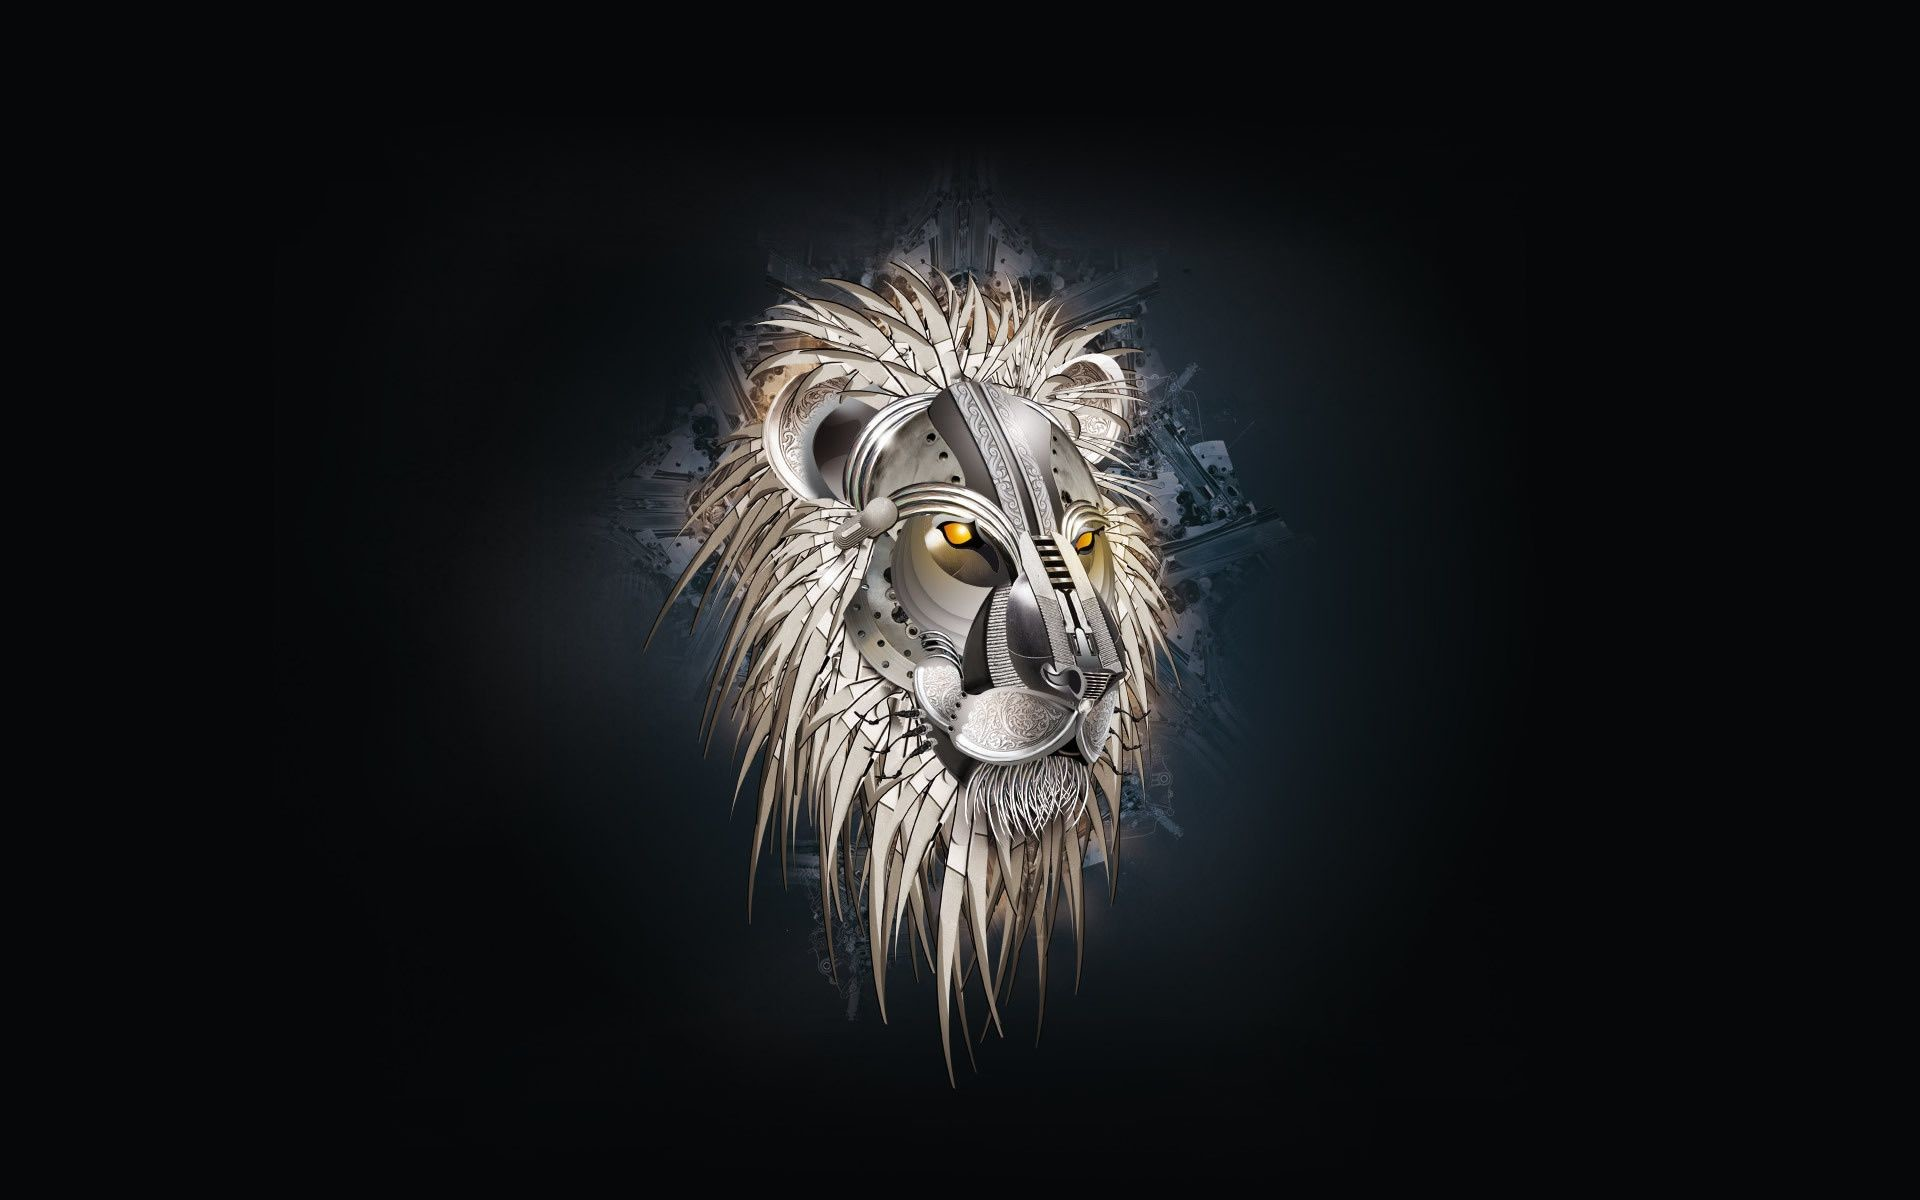 Cool-Lion-Mask-Wallpaper.jpg